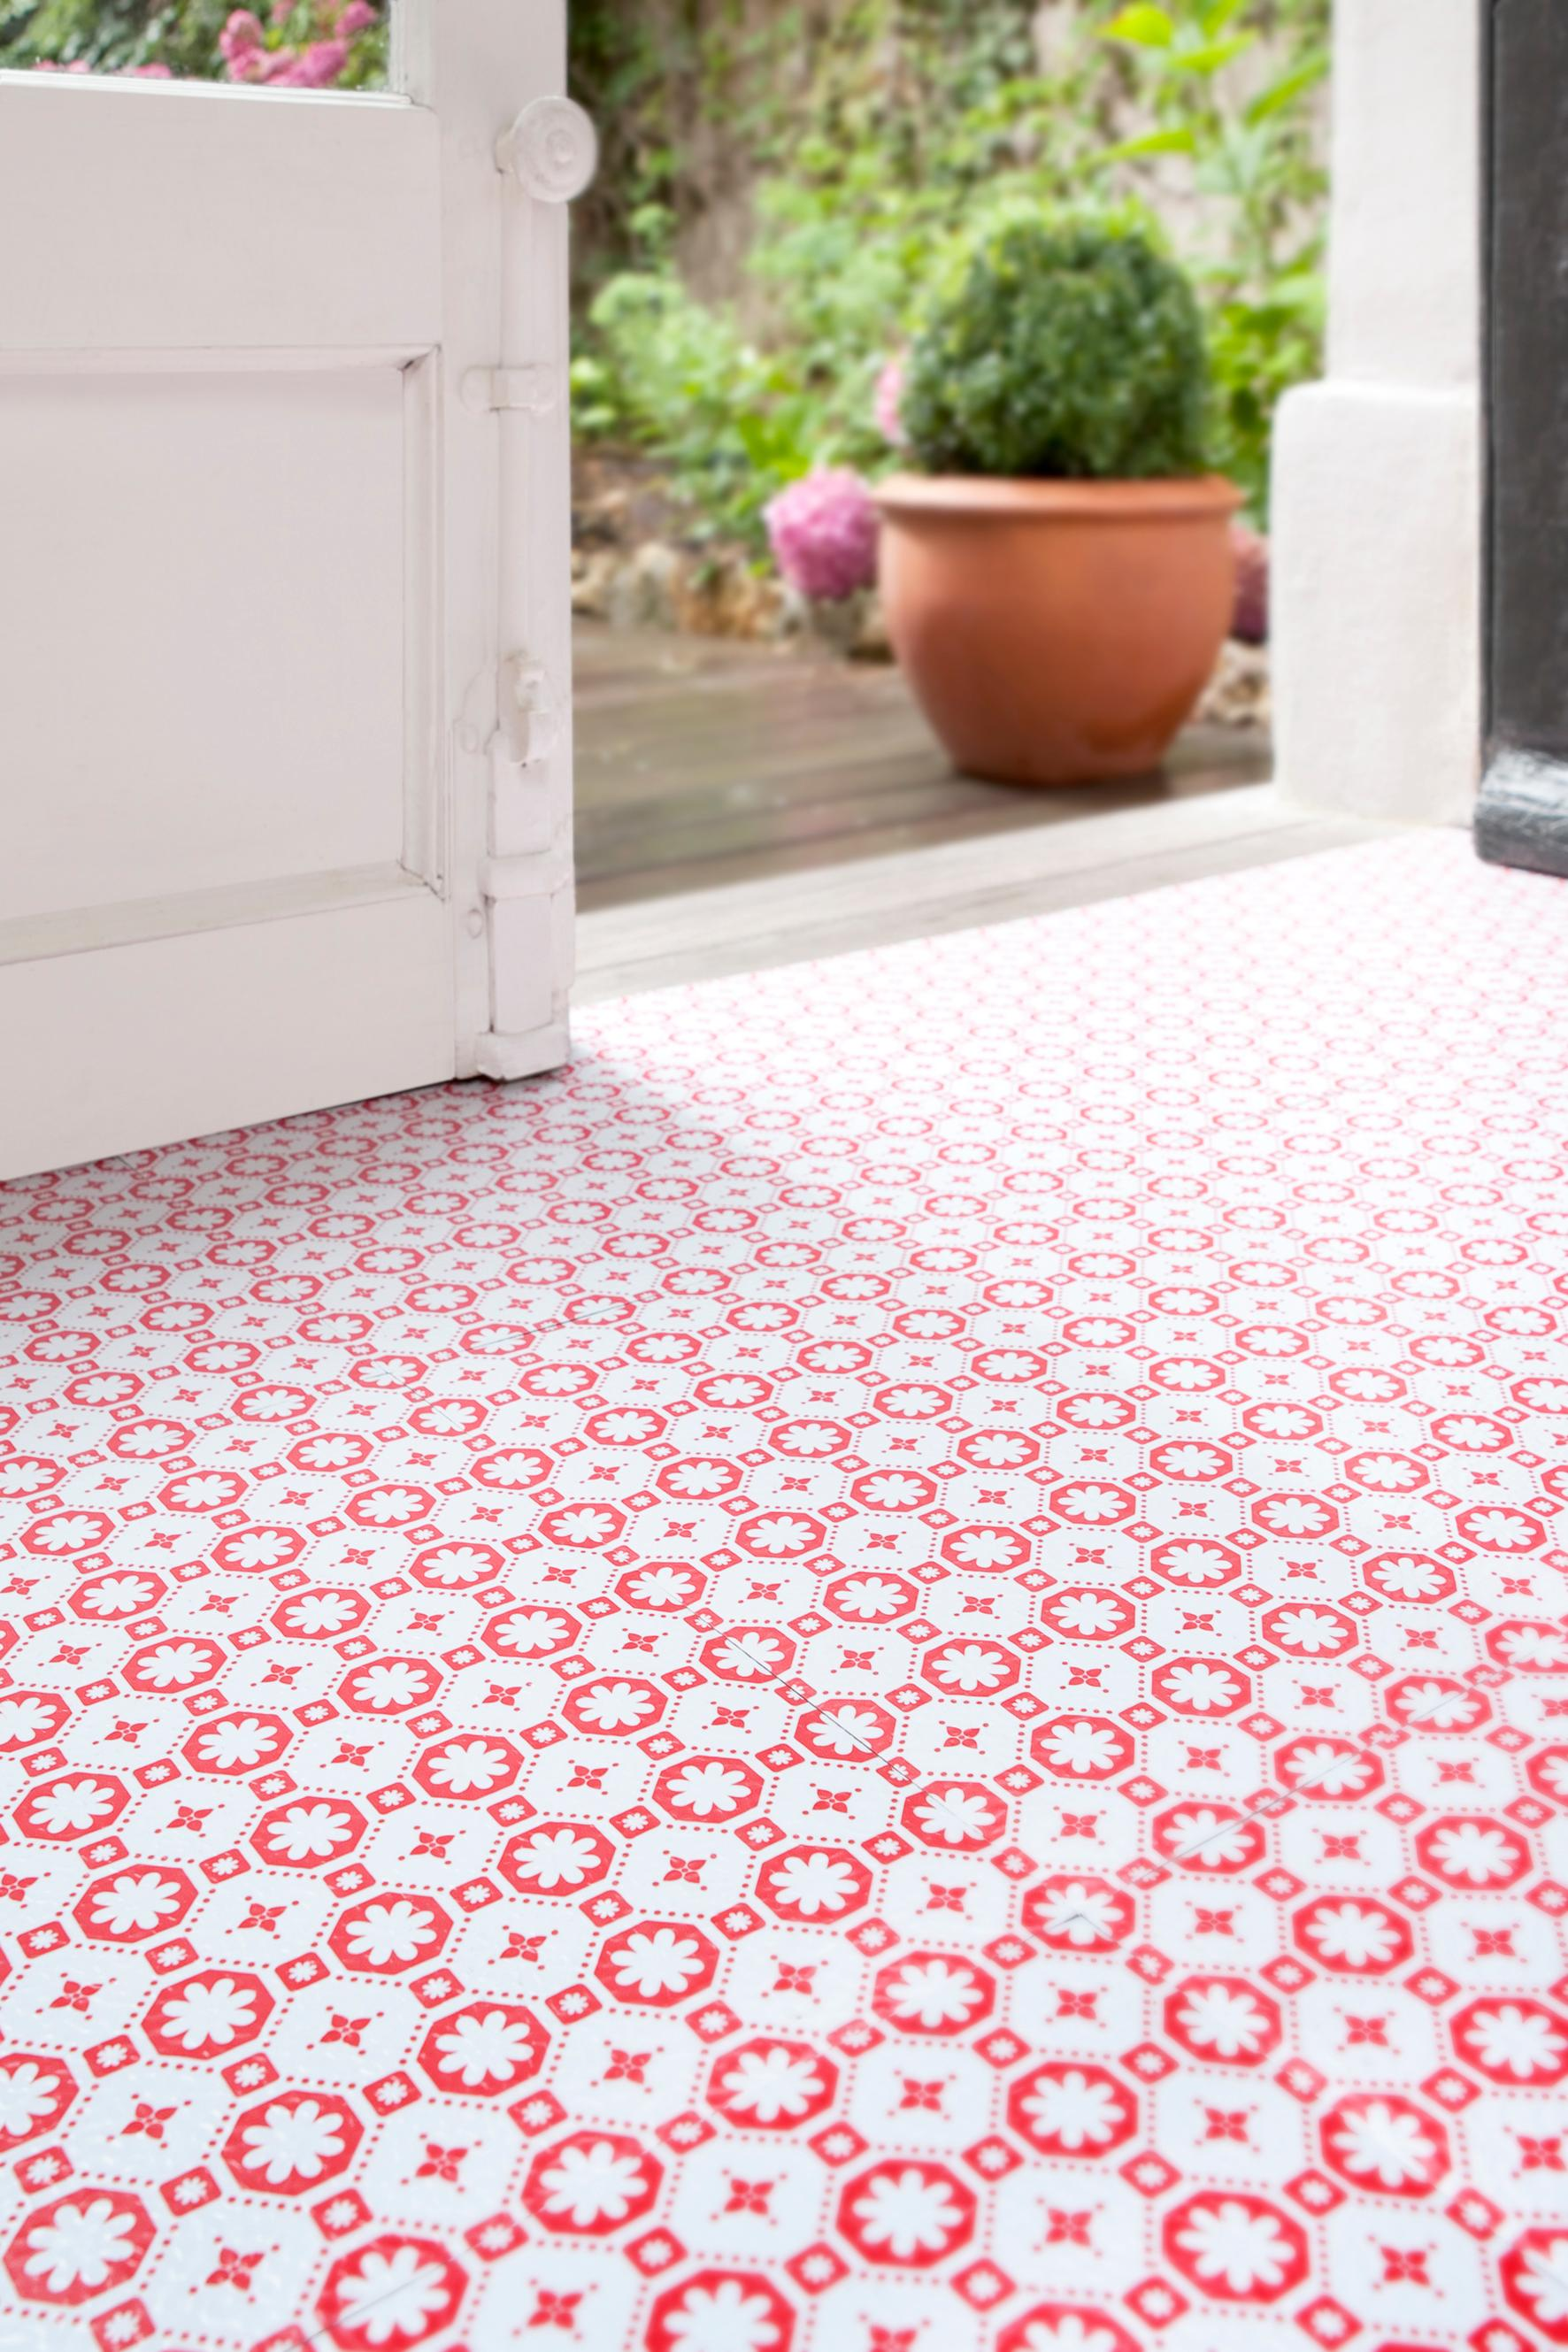 lino flooring tiles vinyl flooring user-ballybofeycarpets 2016-10-20t06:29:51+00:00 EDKSNRO